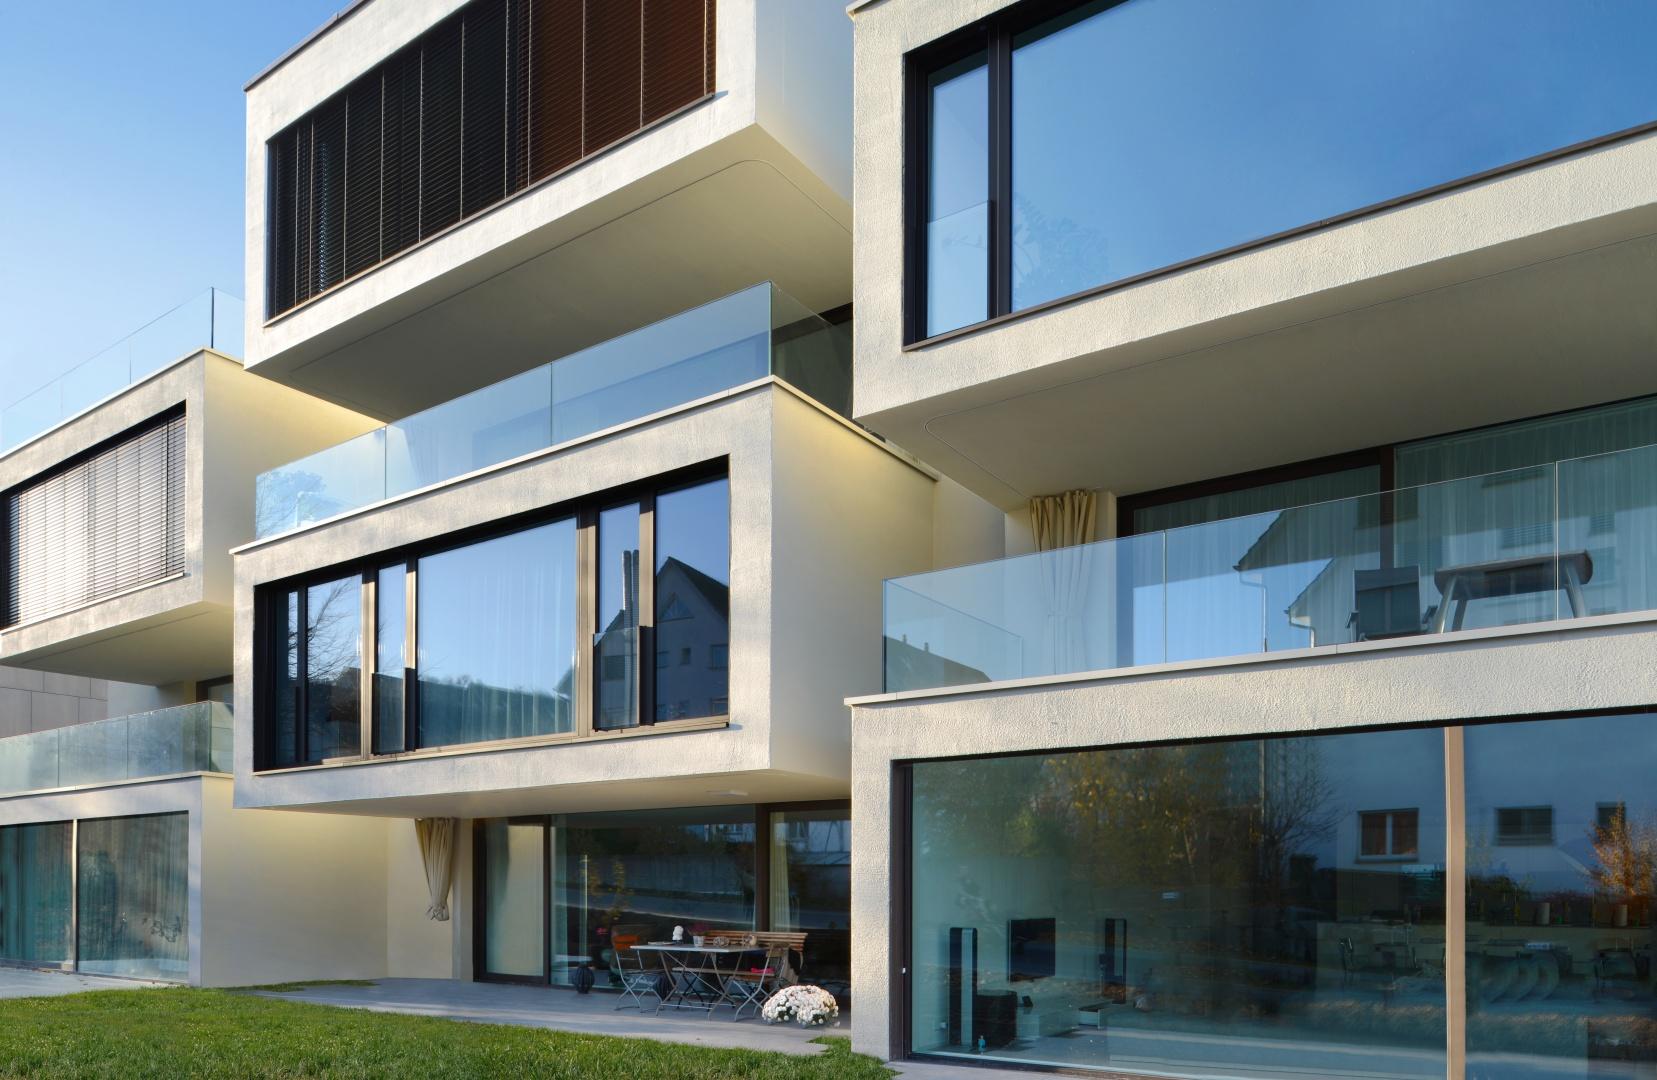 FASSADE_BOXEN DETAIL 2 © Daluz Gonzalez Architekten